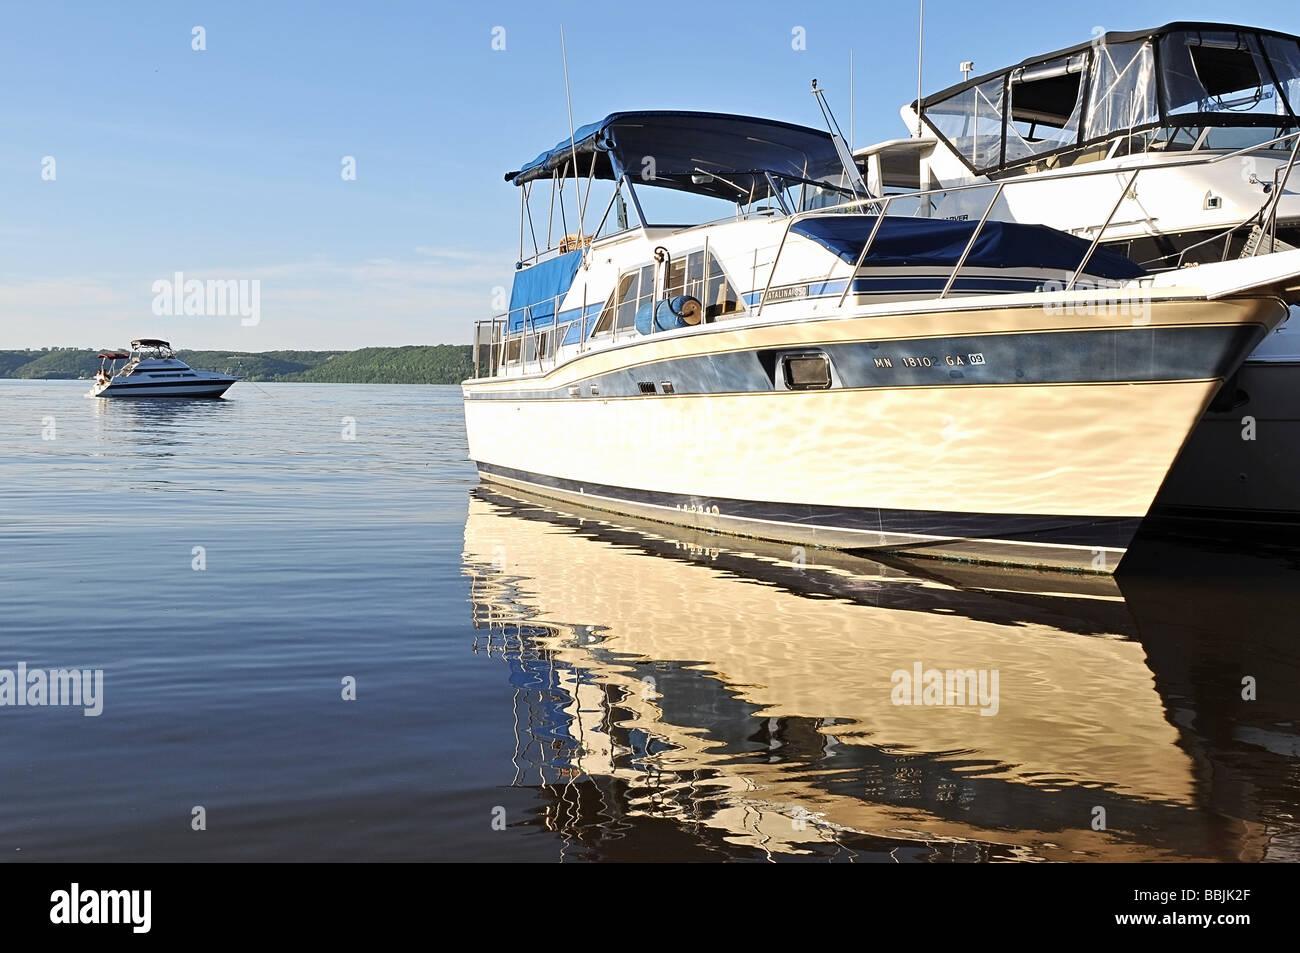 Boats anchored. - Stock Image